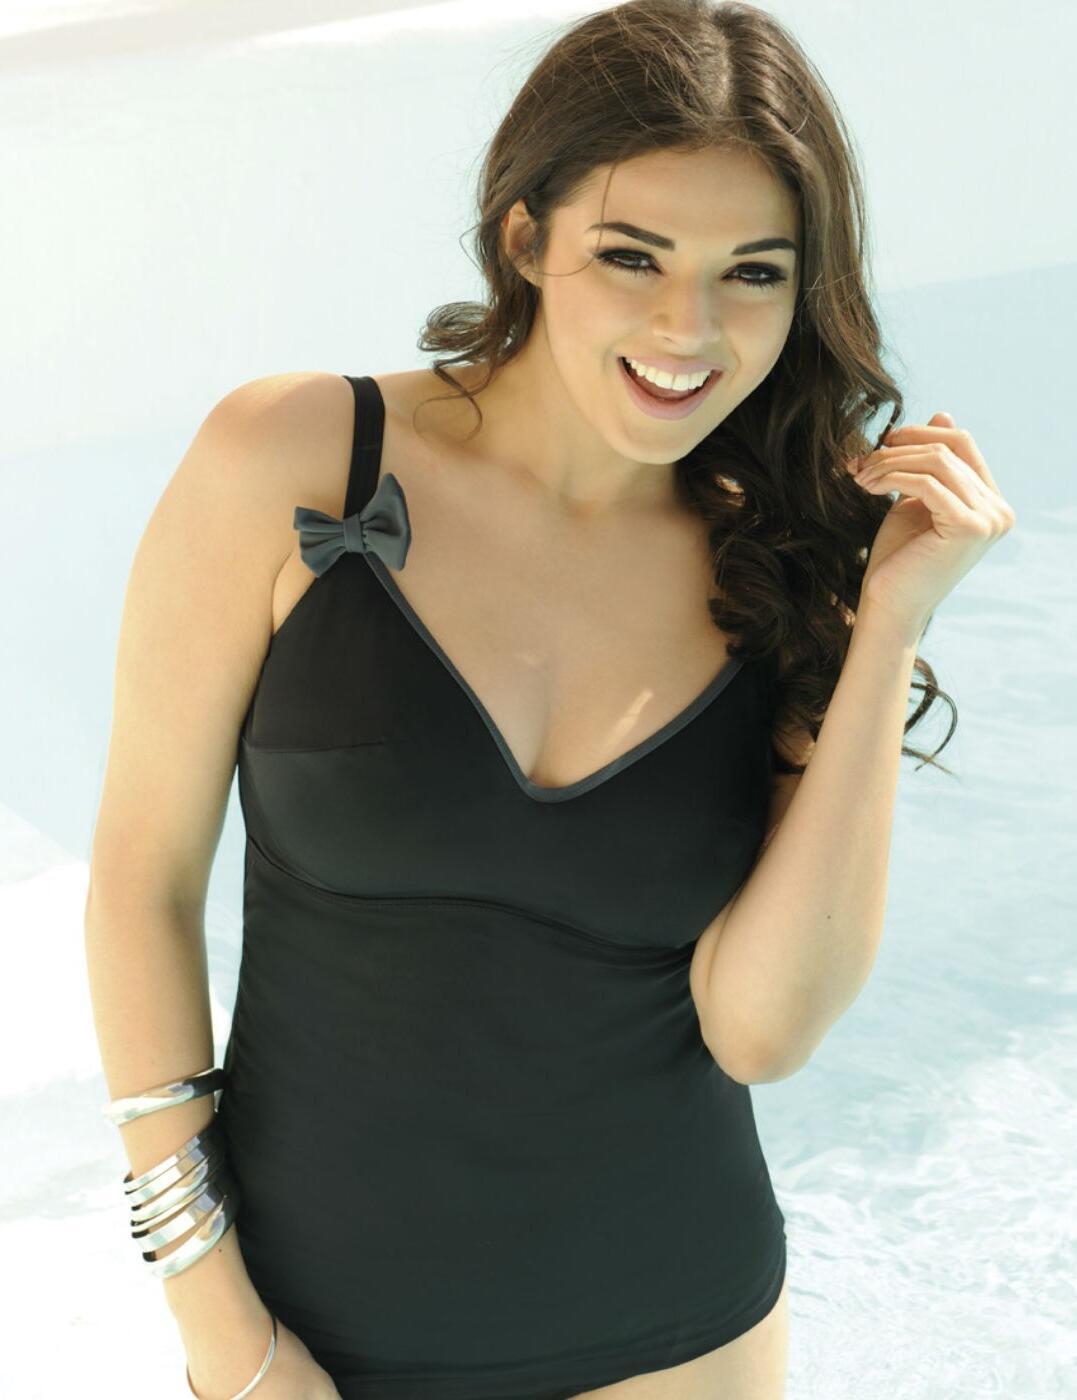 CS8006 Curvy Kate Moonlight Tankini Top Black  - CS8006 Black/Charcoal